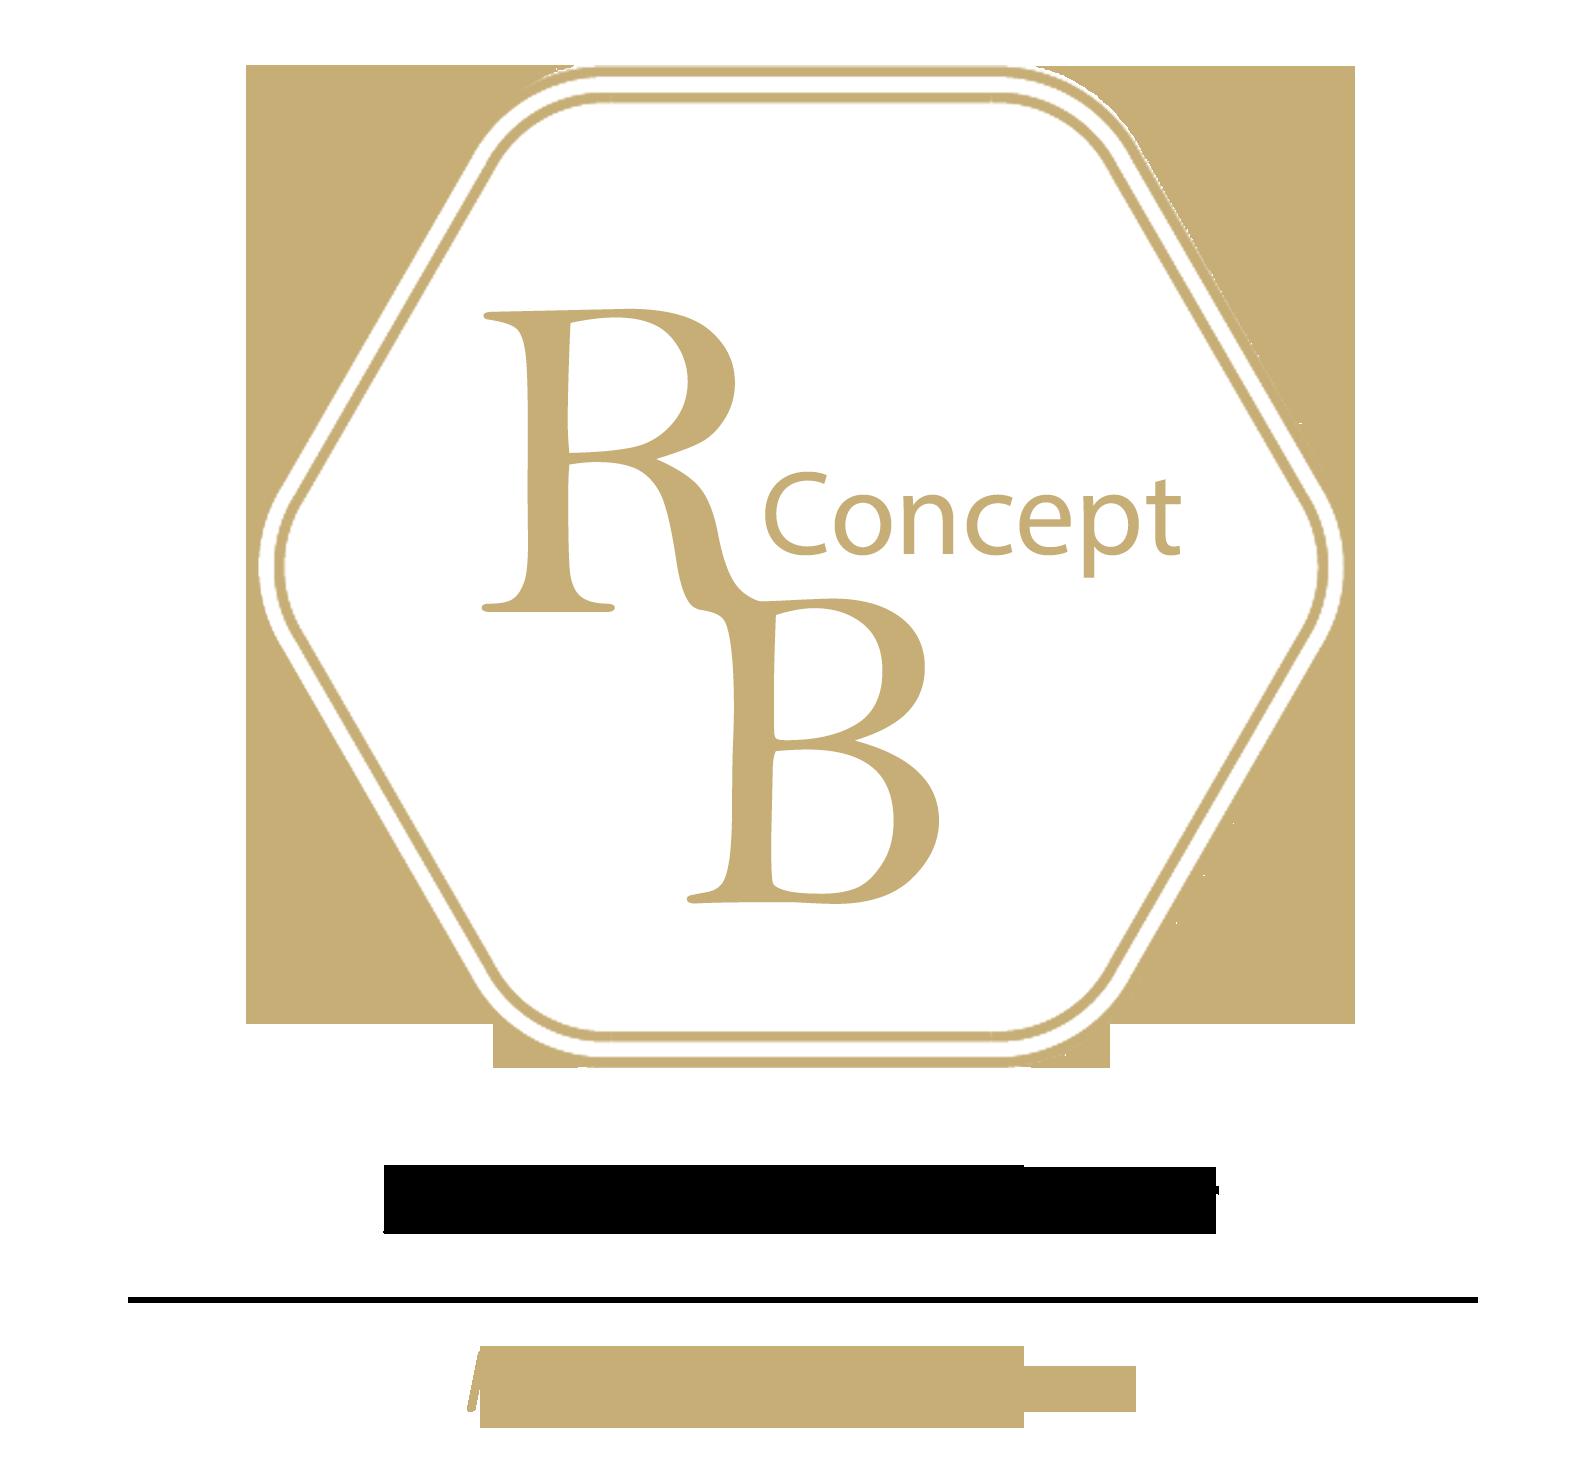 RB Concept